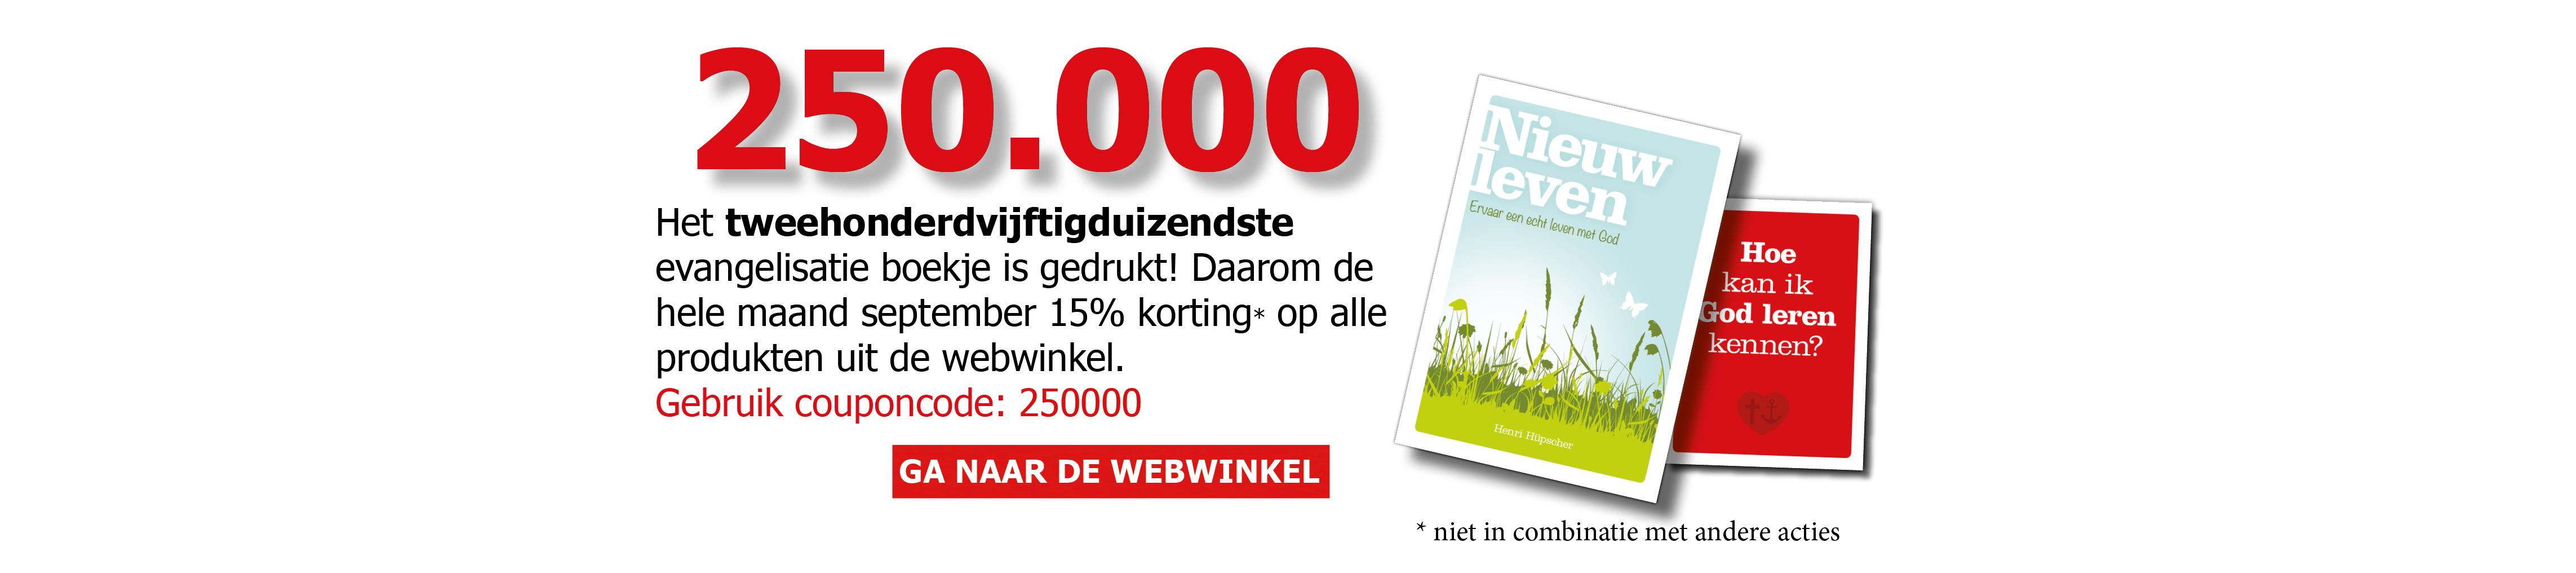 webshop-250000